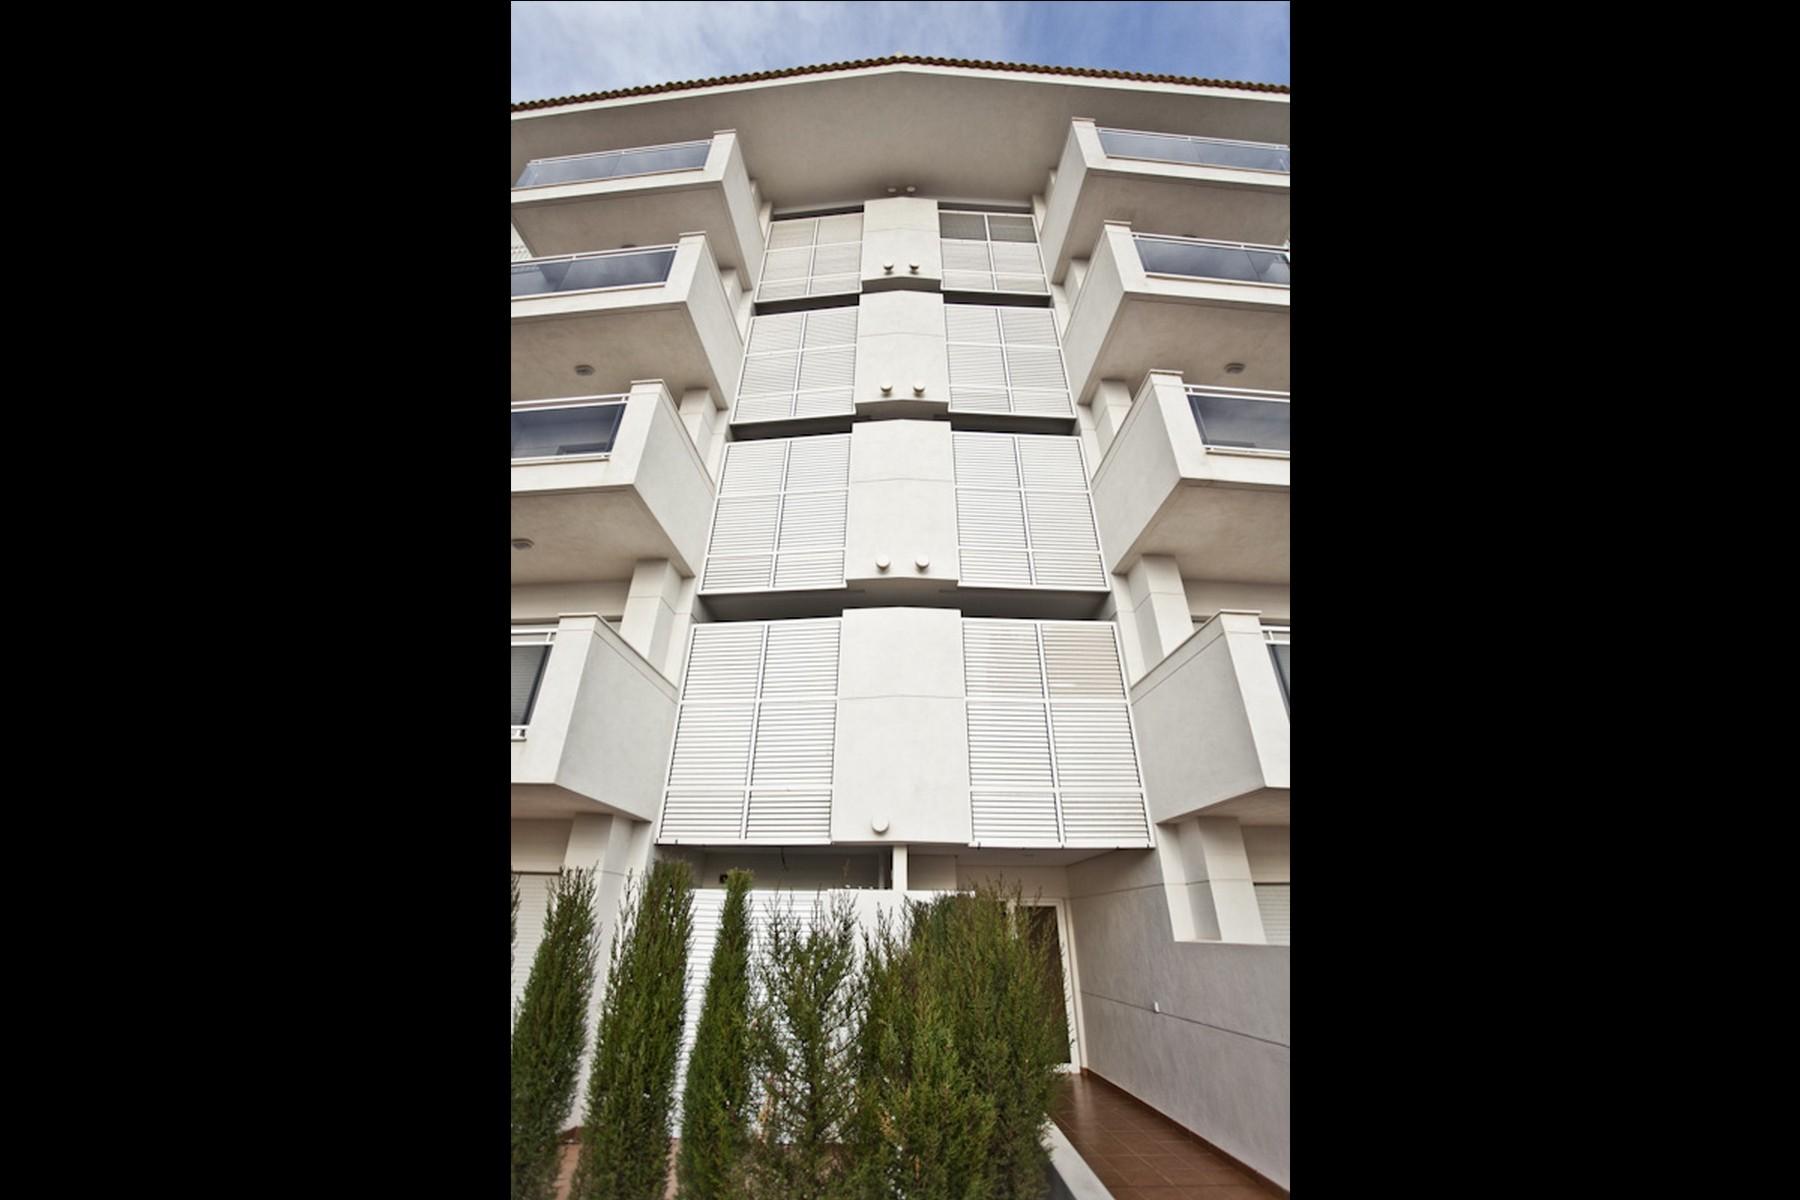 Imaginarq-155-Edificio-Viviendas-Altea-Alicante-04A